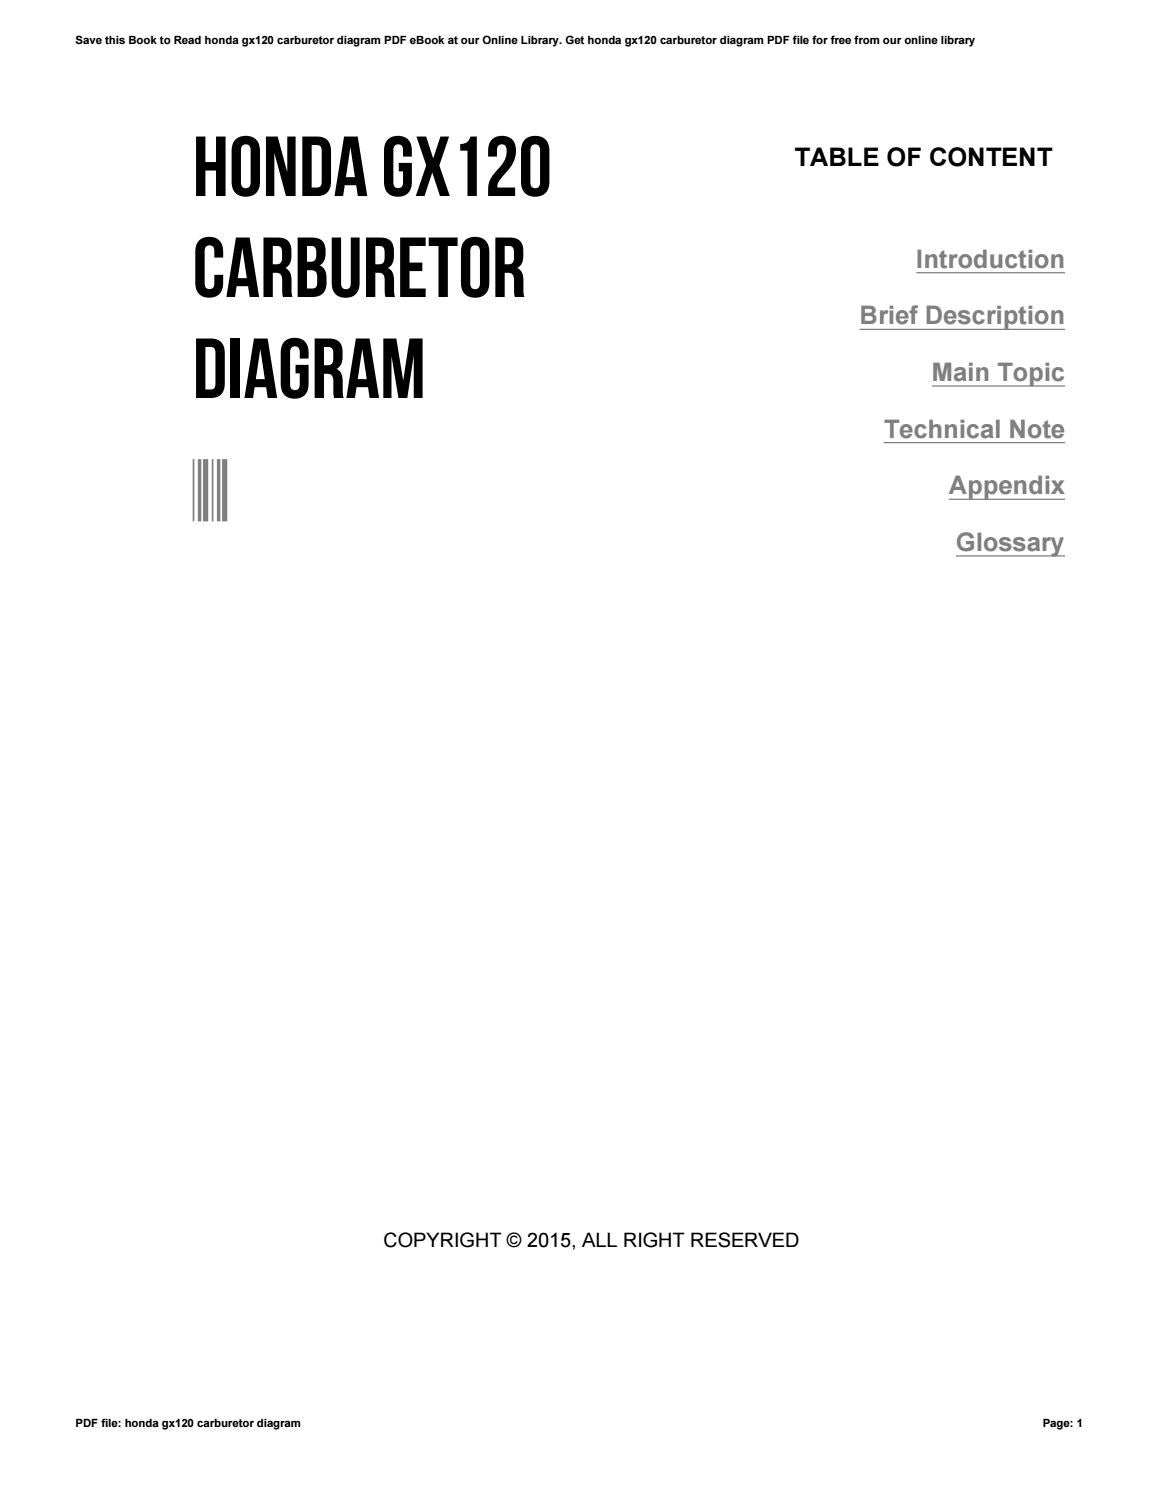 hight resolution of honda carburetor diagram